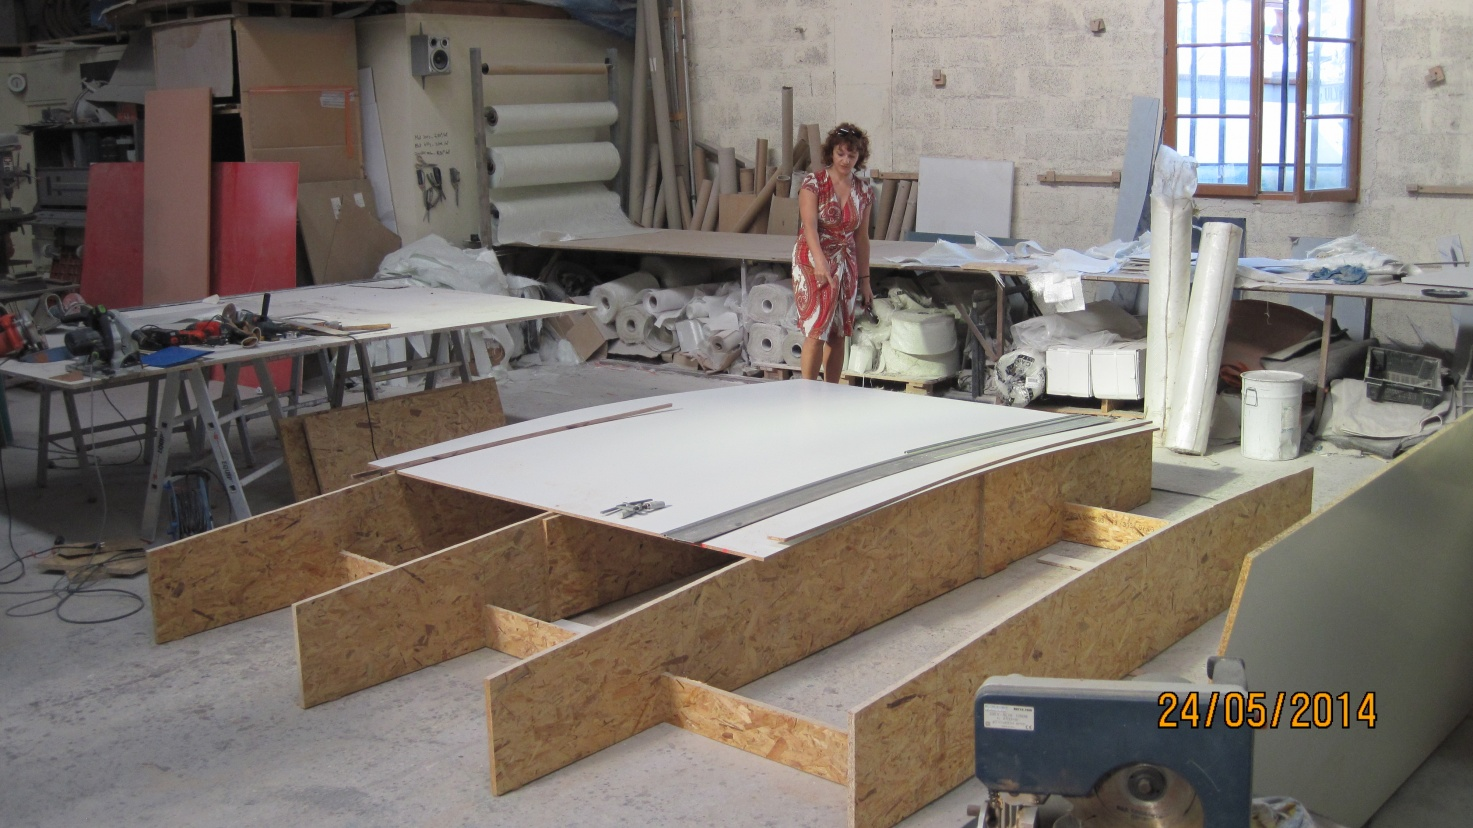 Click image for larger version  Name:Bimini Construction du moule 24-5-14.jpg Views:90 Size:404.1 KB ID:110614